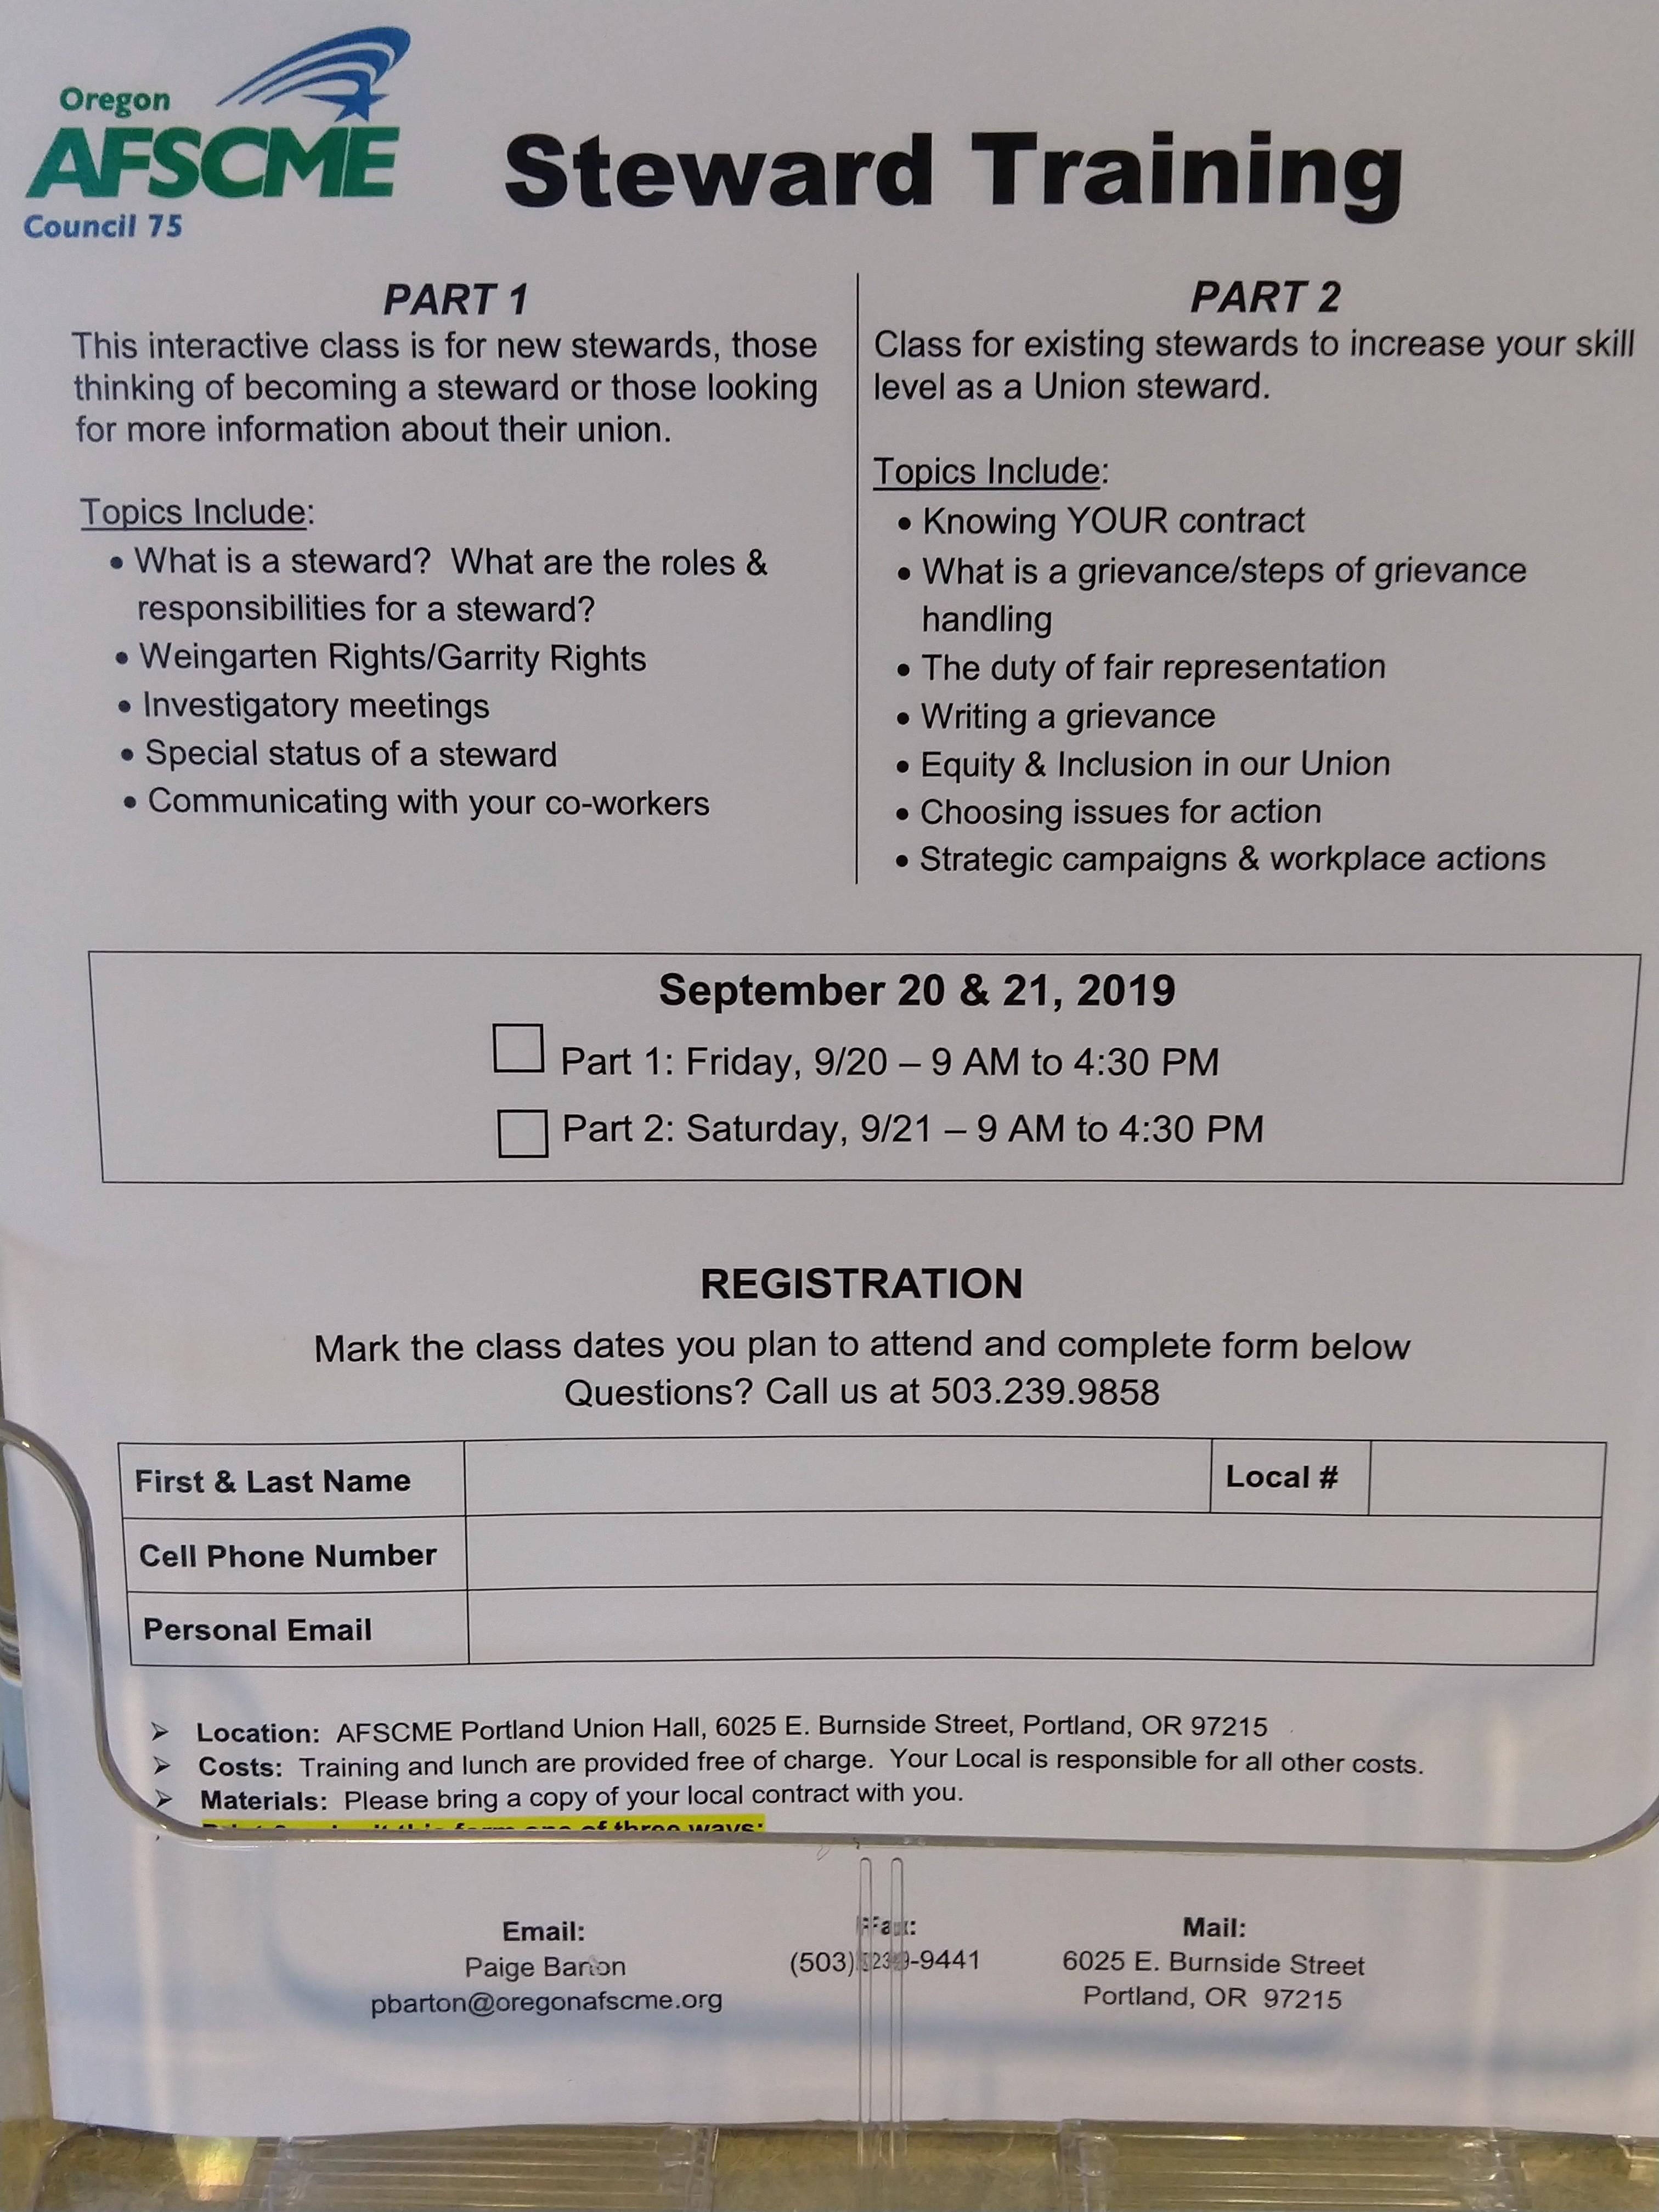 September 2019 Steward Training Flyer